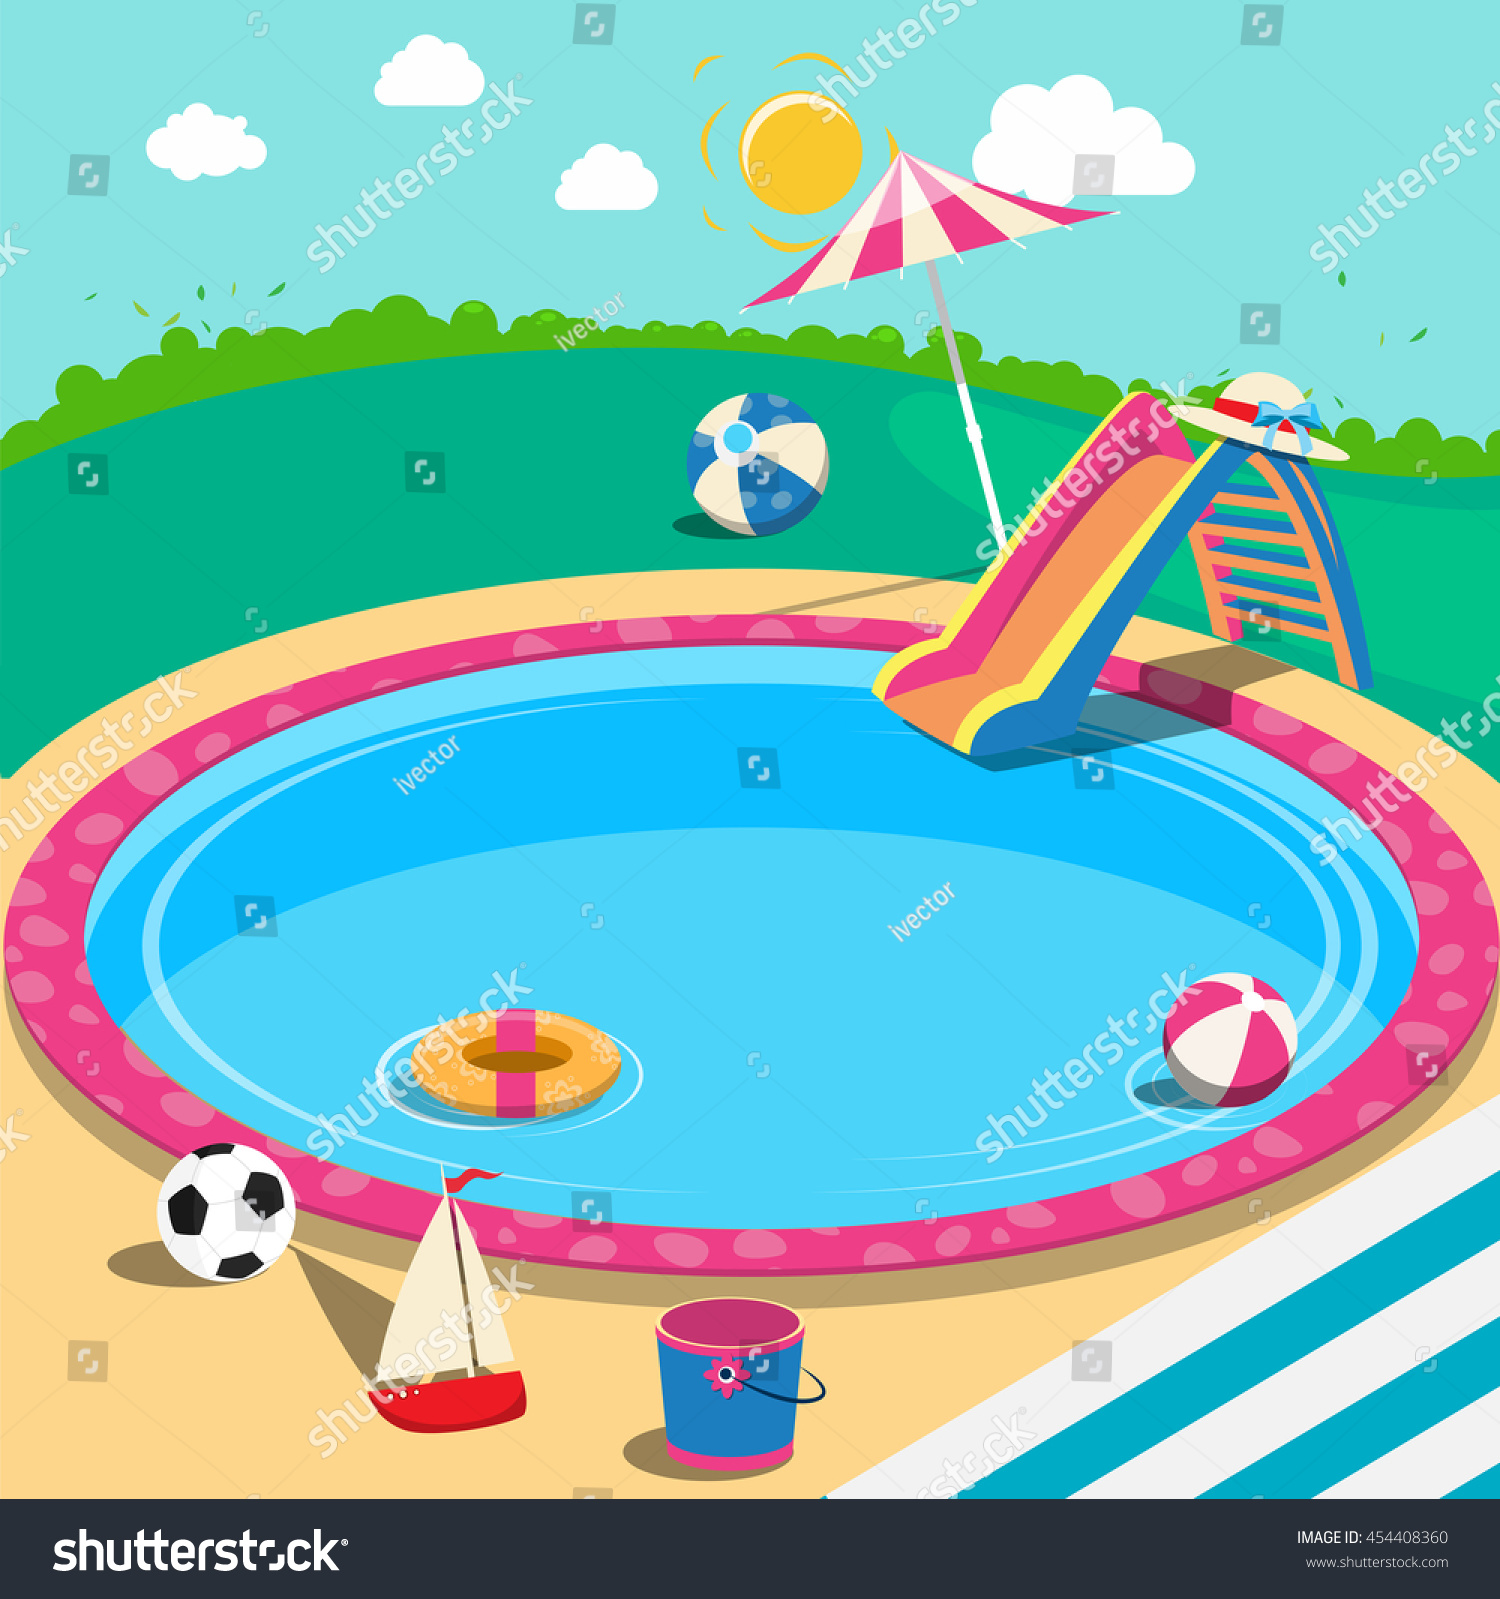 summer wallpaper swimming vector - photo #13